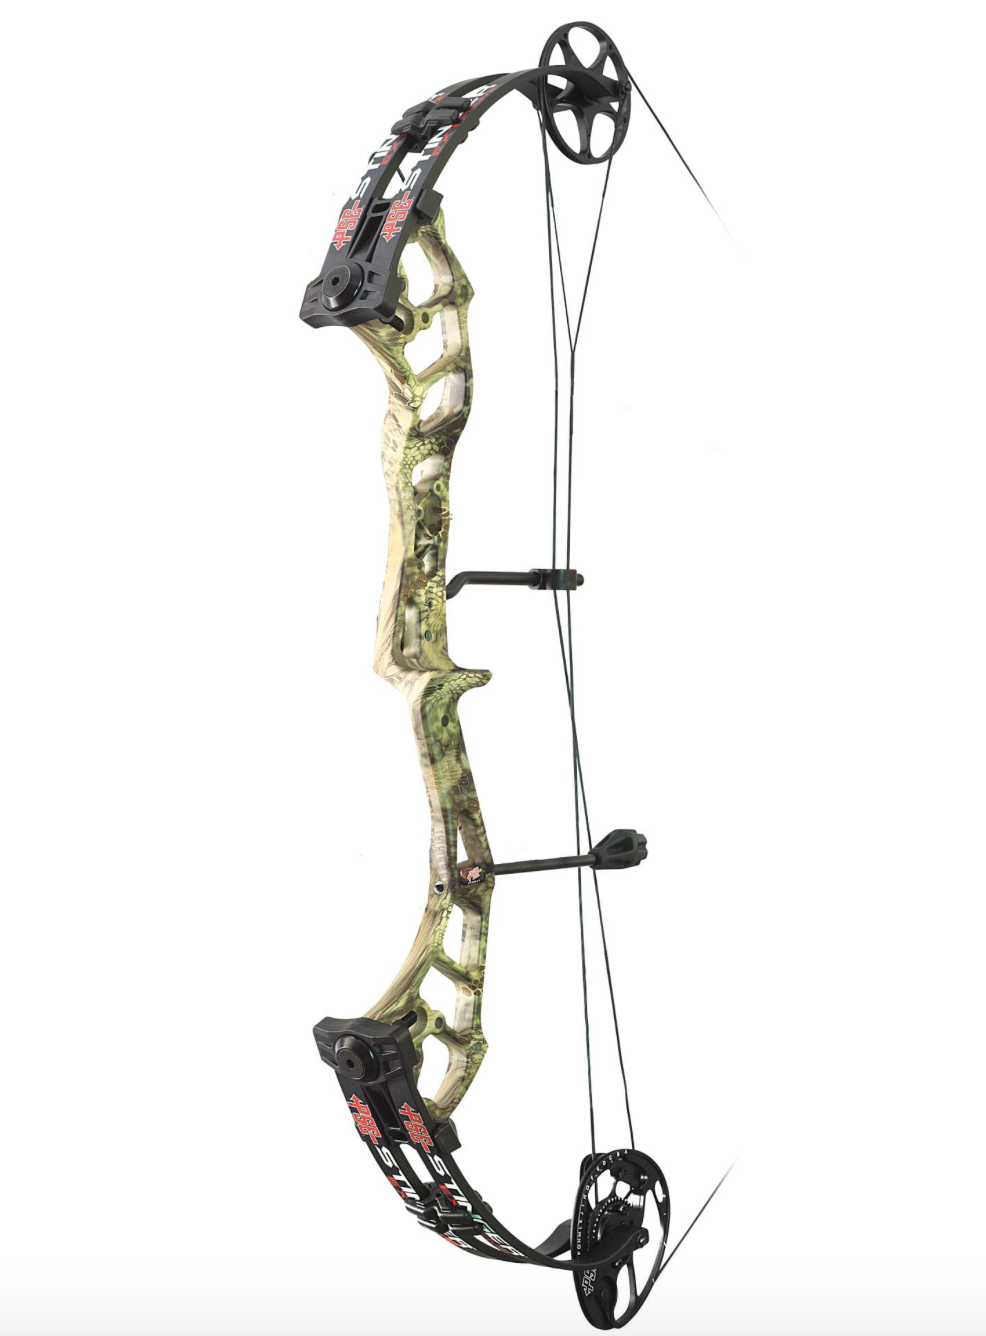 PSE Stinger Extreme针刺EXT狩猎复合弓